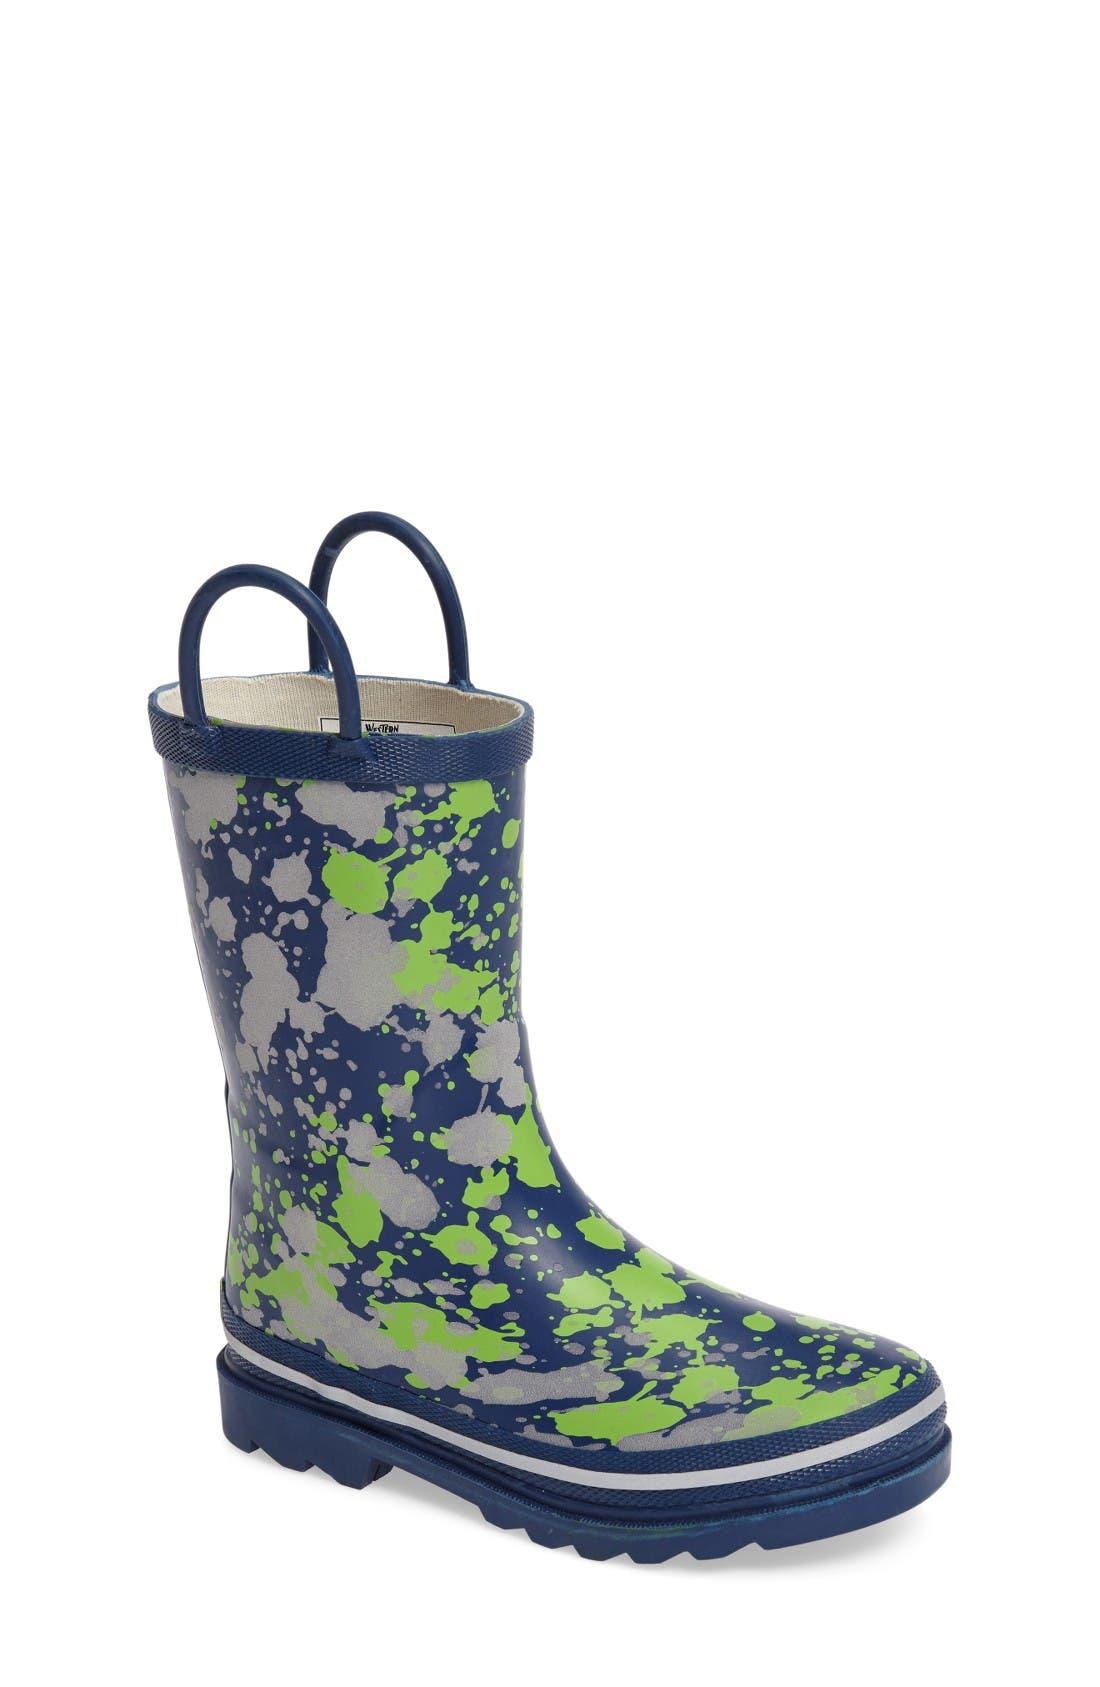 WESTERN CHIEF Paintball Rain Boot